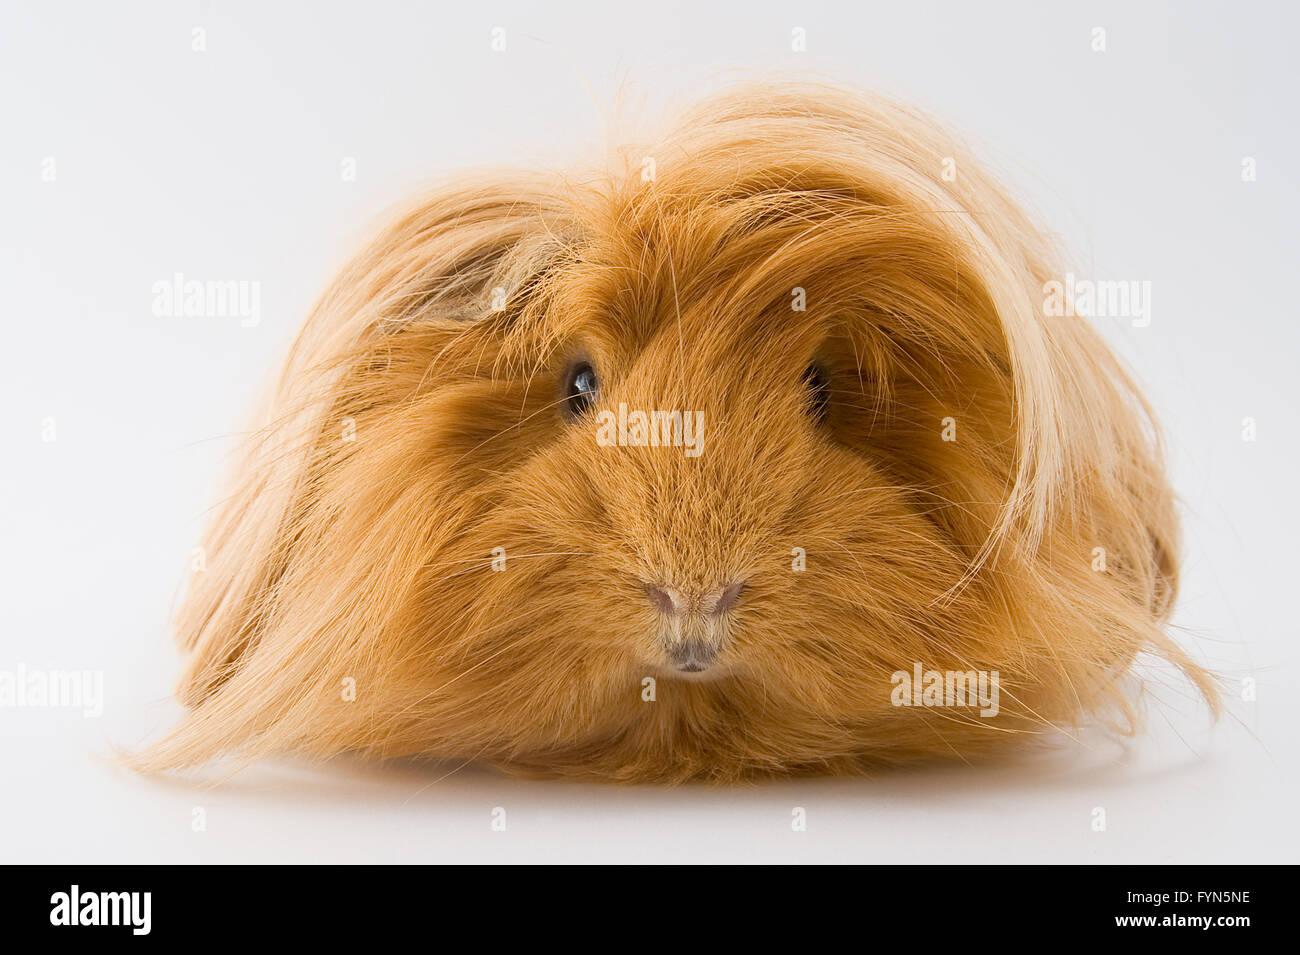 Guinea pig breed Sheltie. - Stock Image